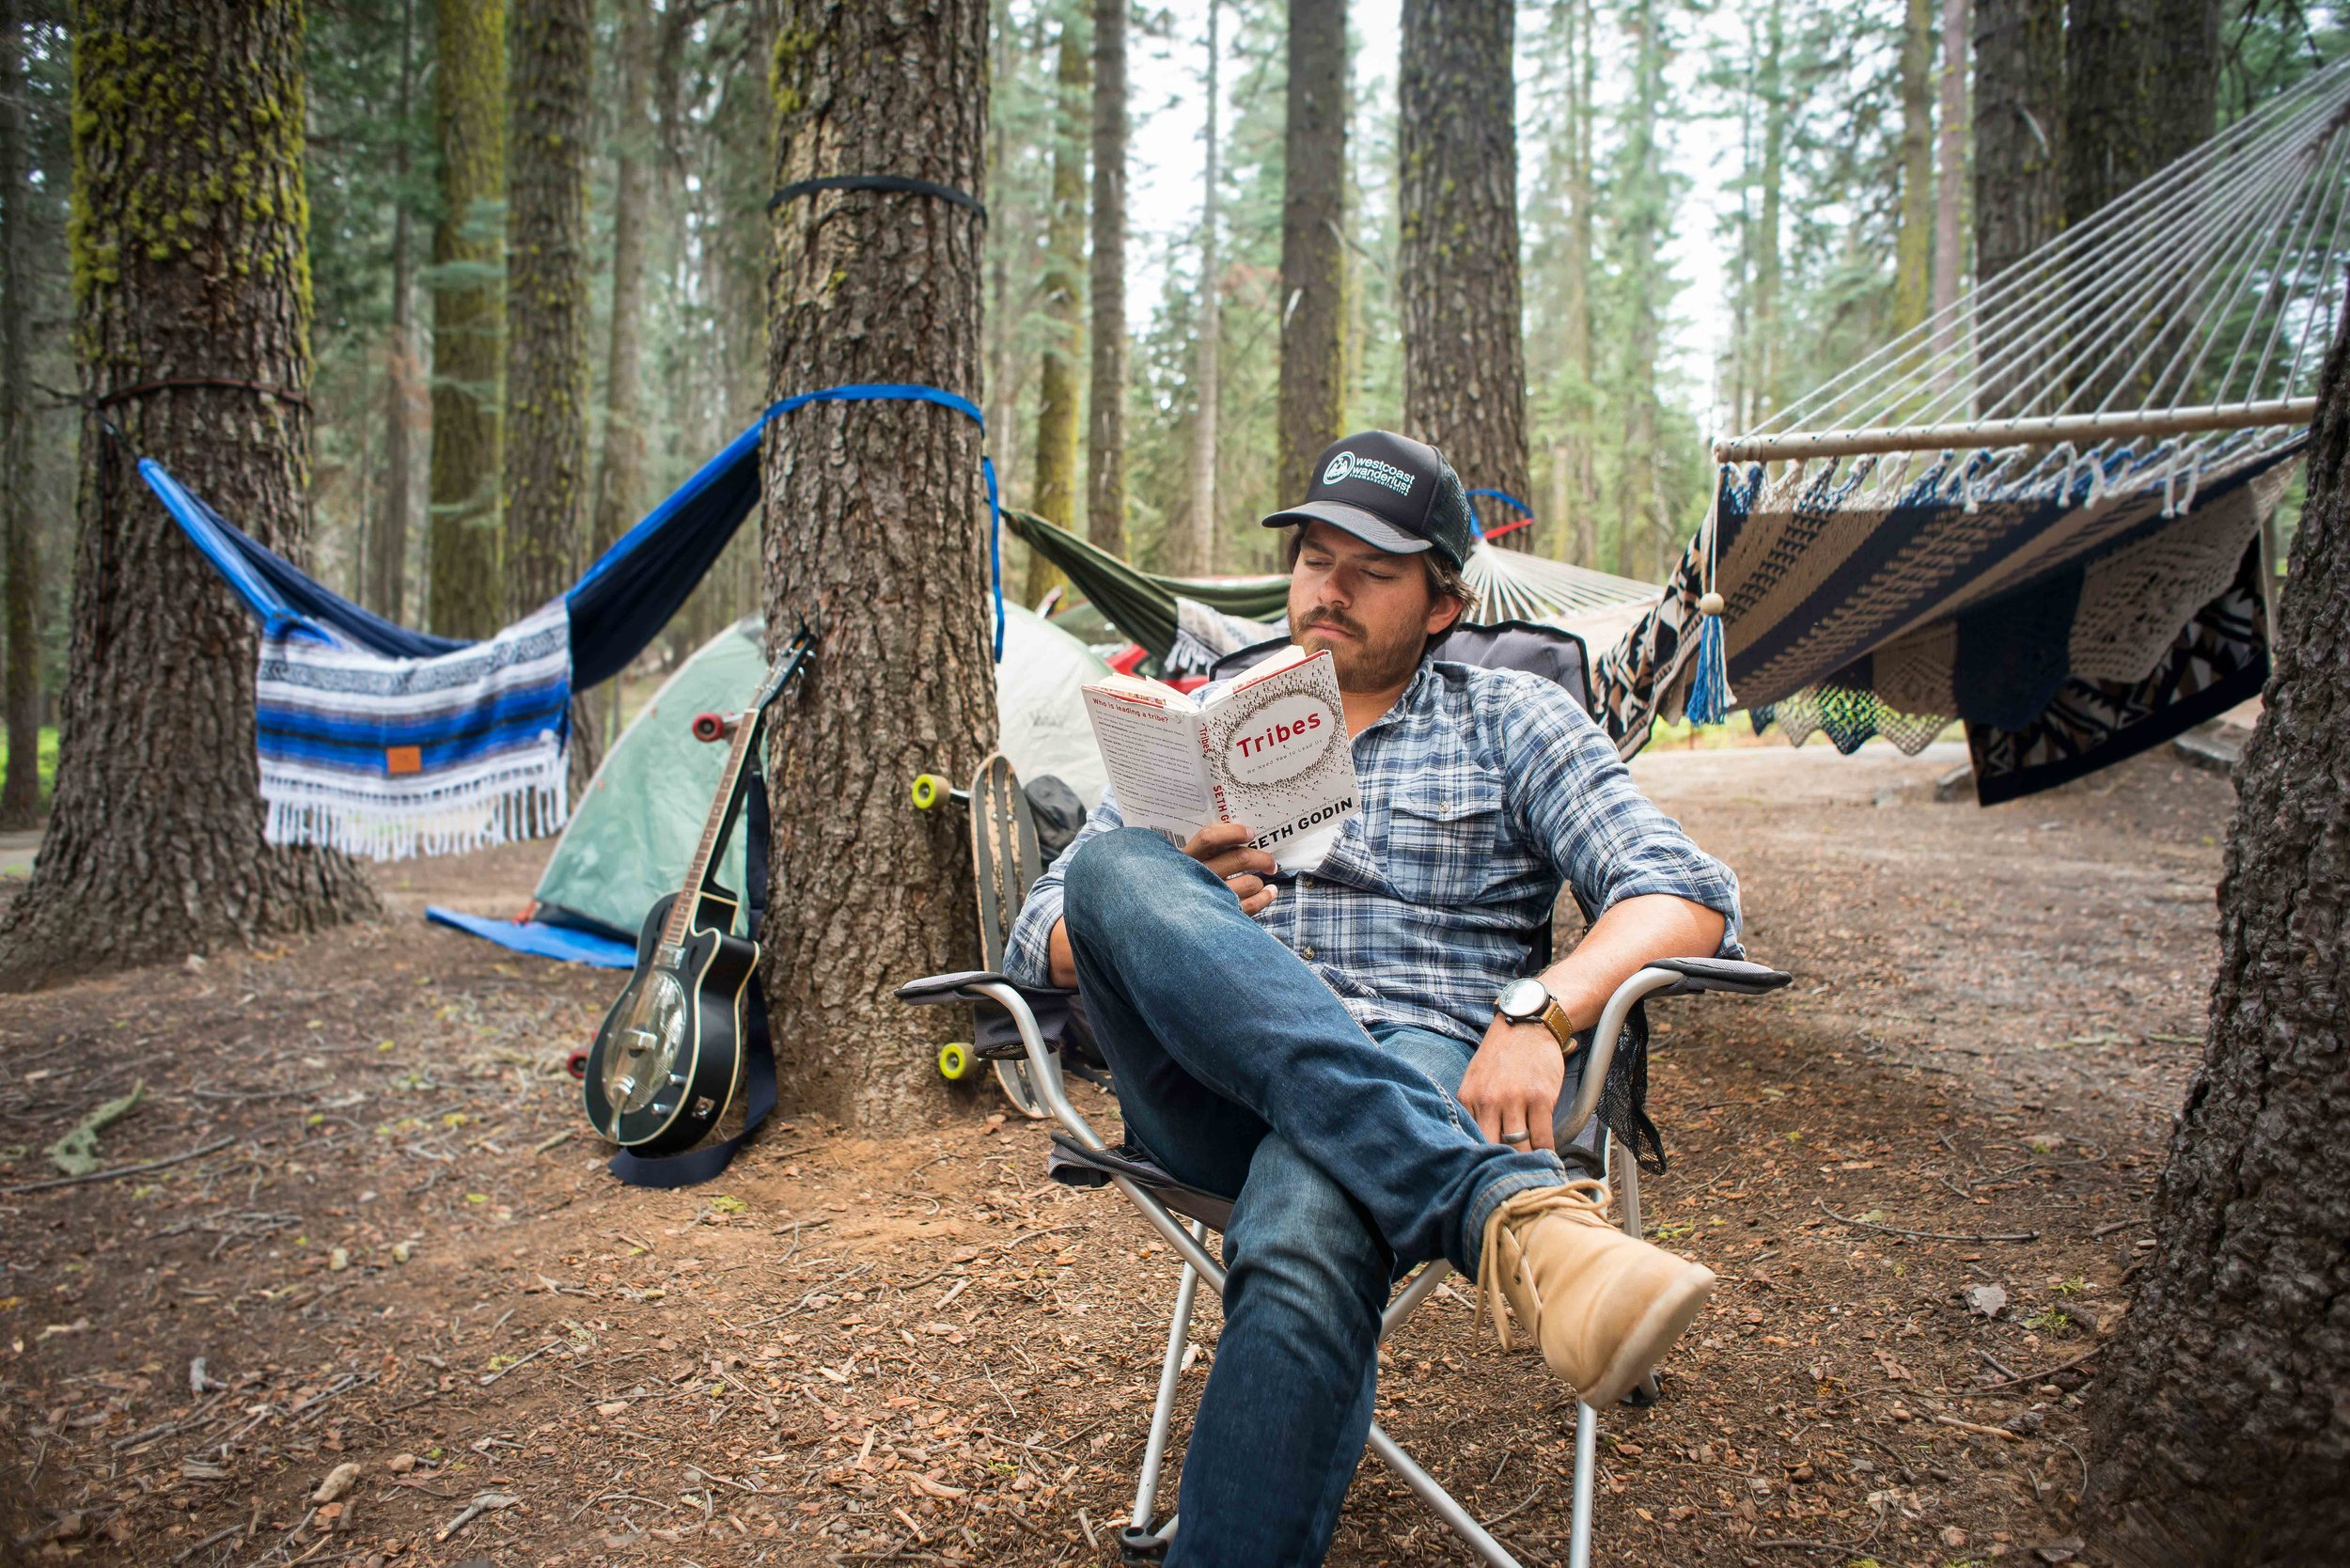 FMC_Yosemite_0616-1_WebEdit.jpg